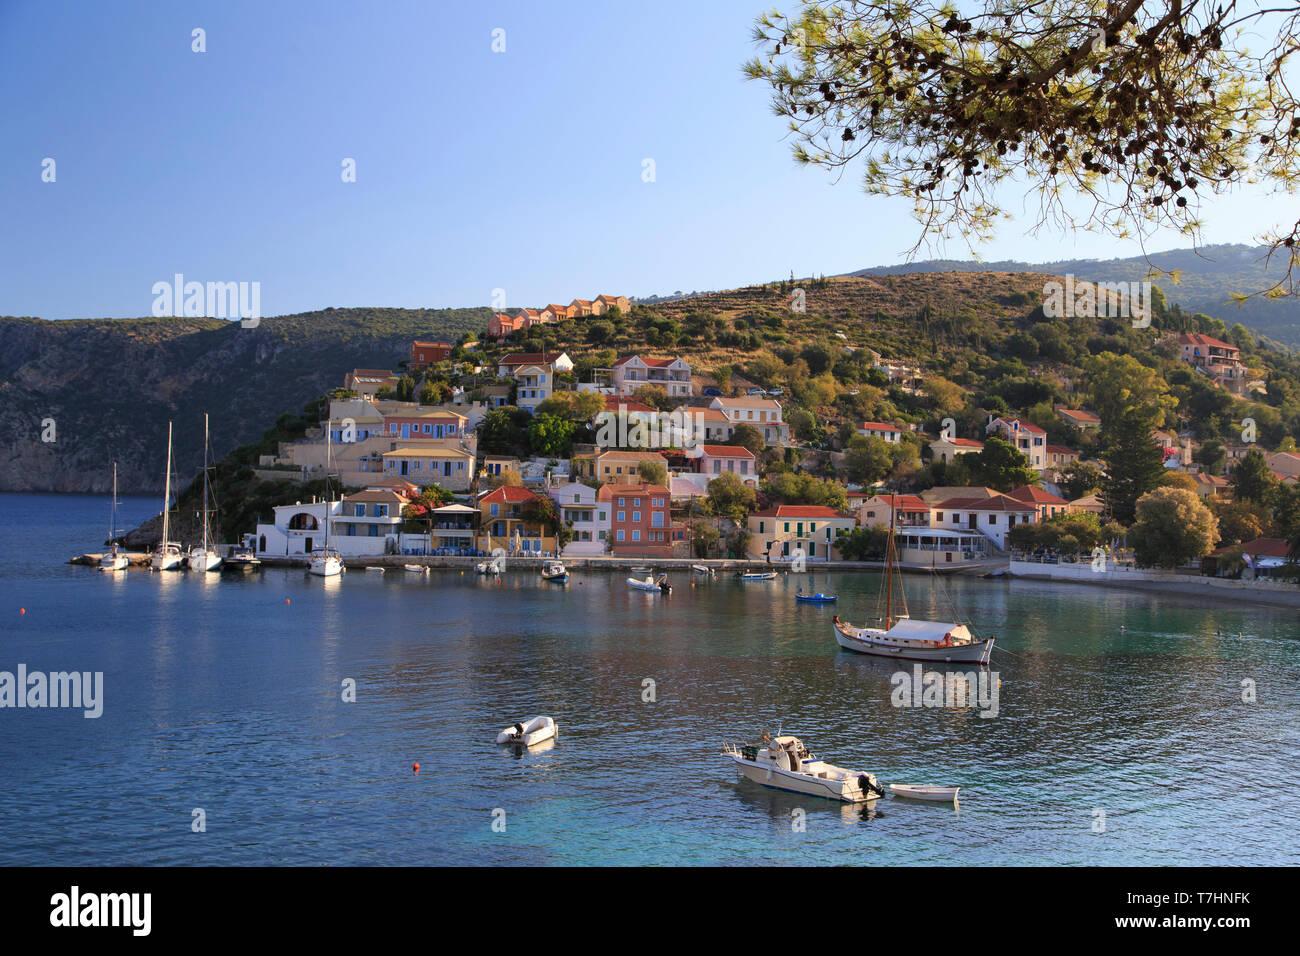 Greece, Ionian Islands, Kefalonia, Fiscardo Vilage - Stock Image